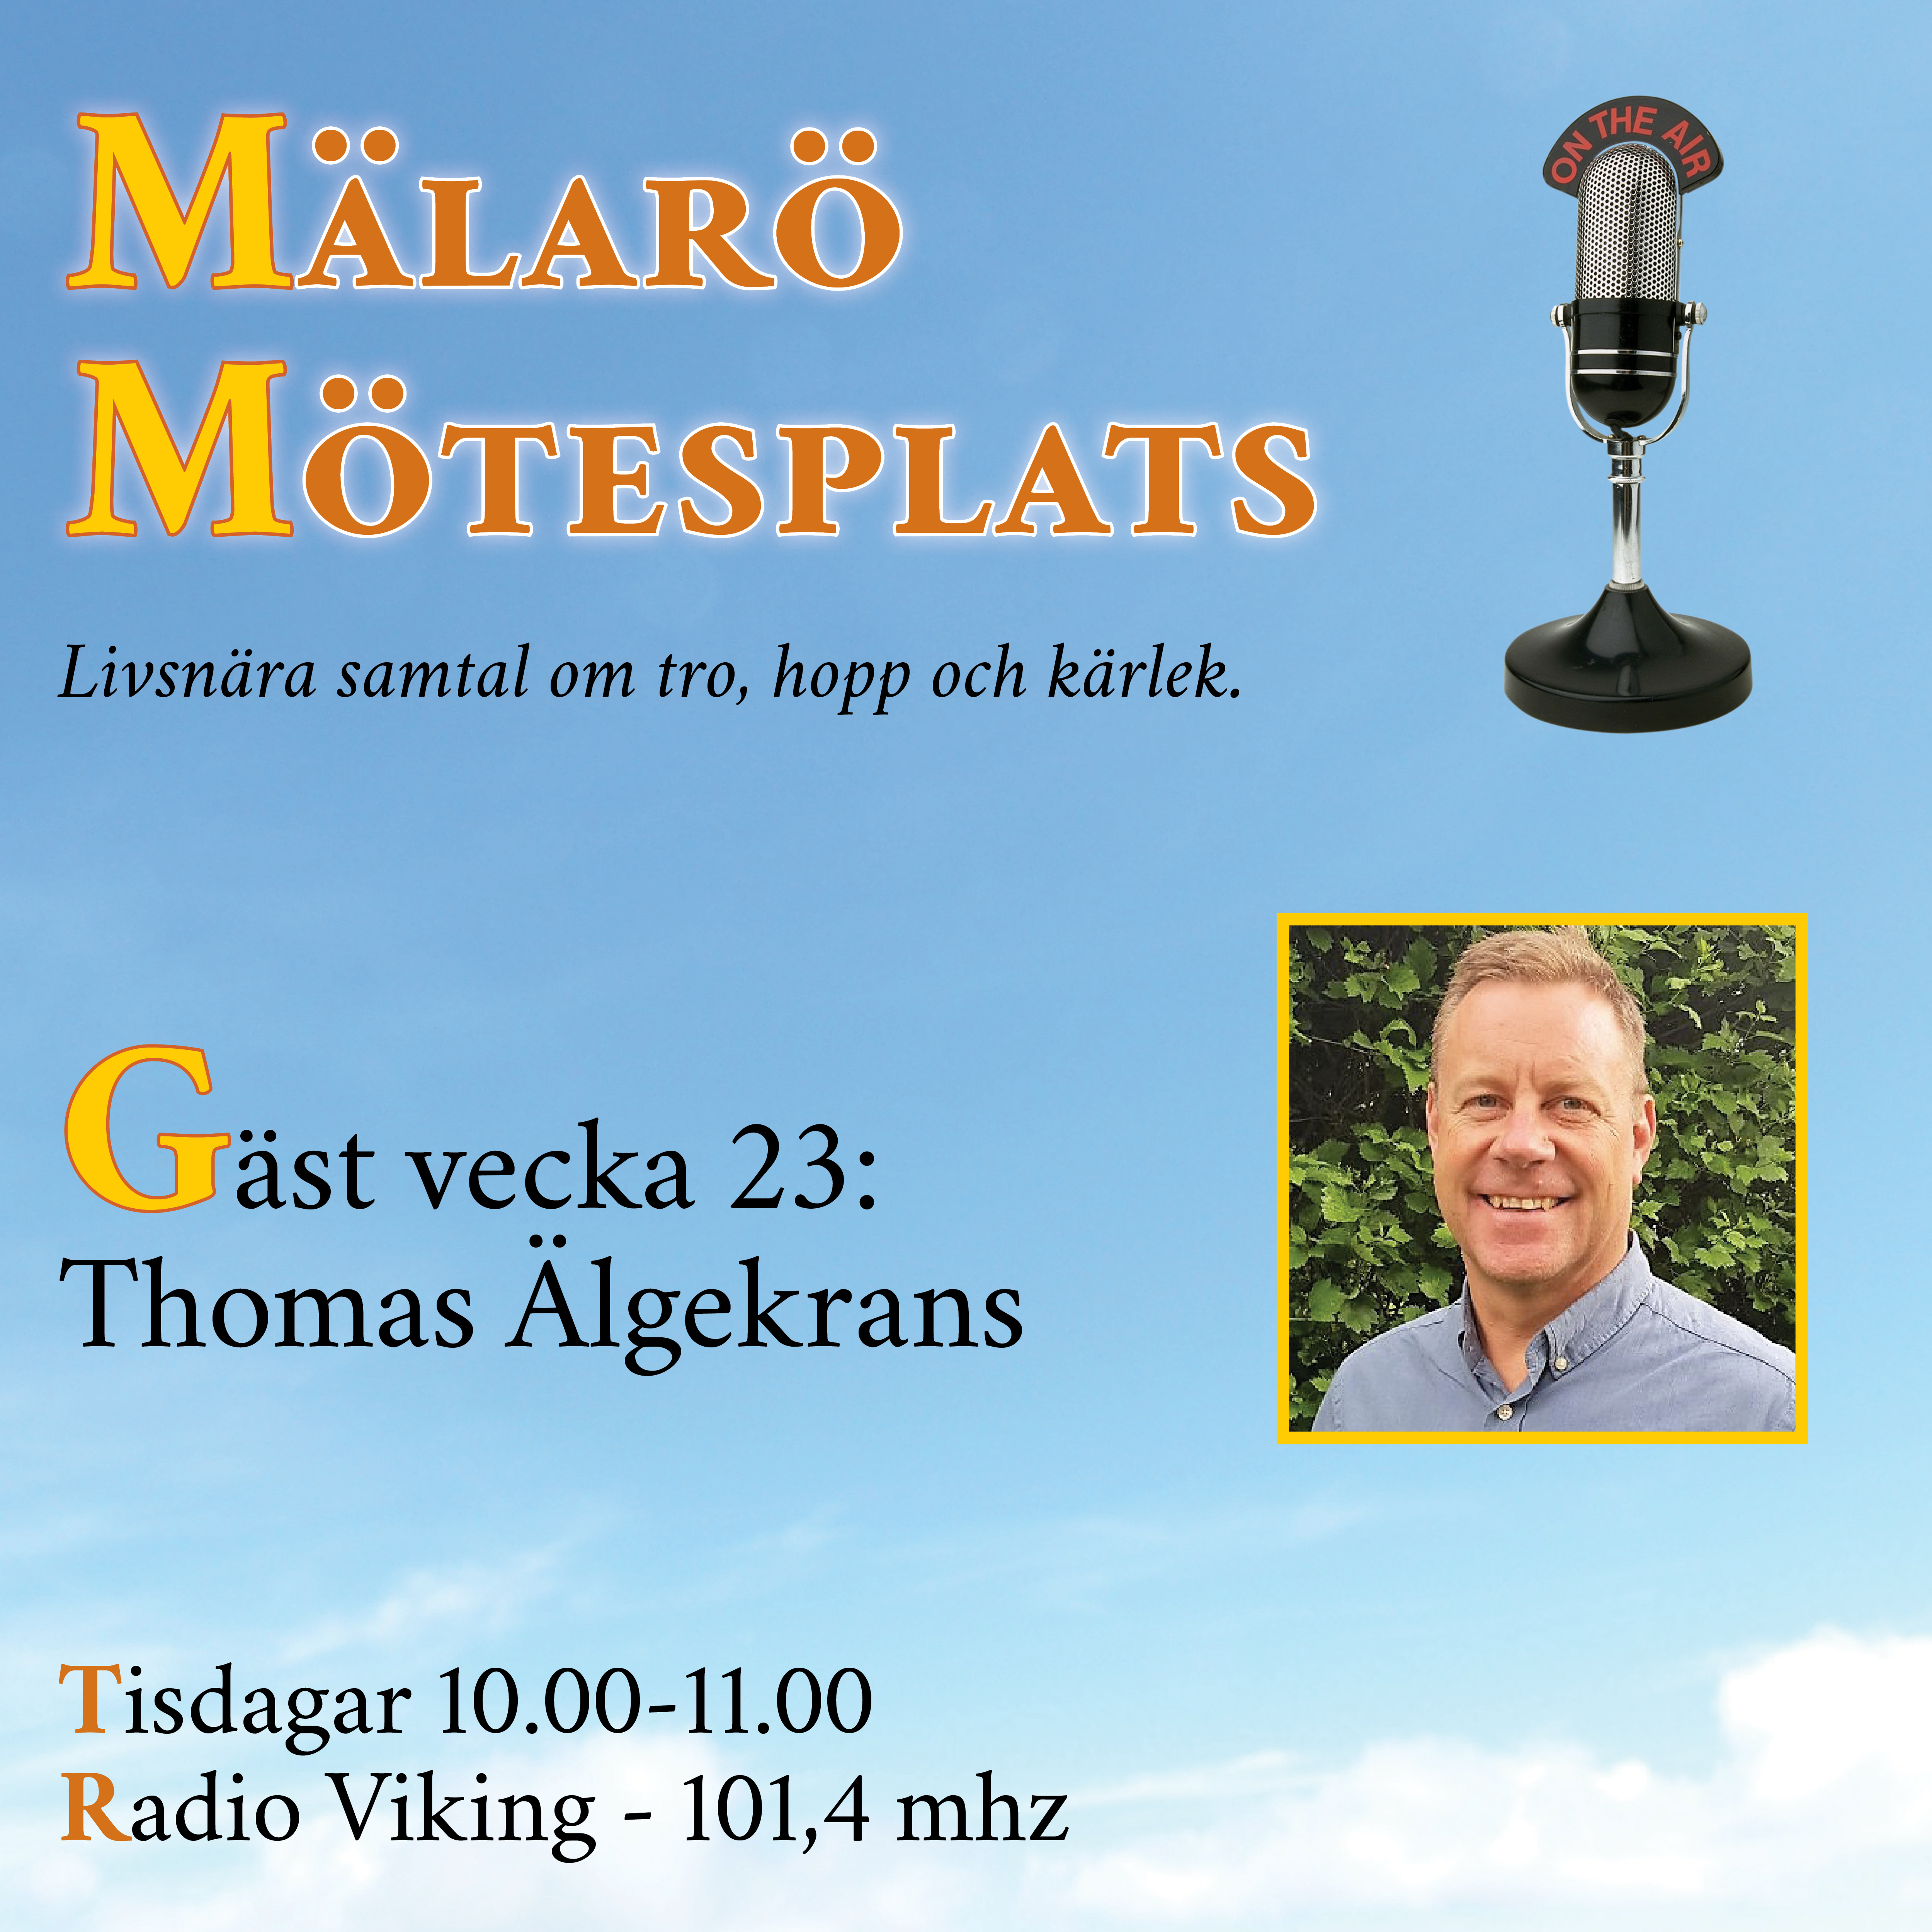 Möte med Thomas Älgekrans